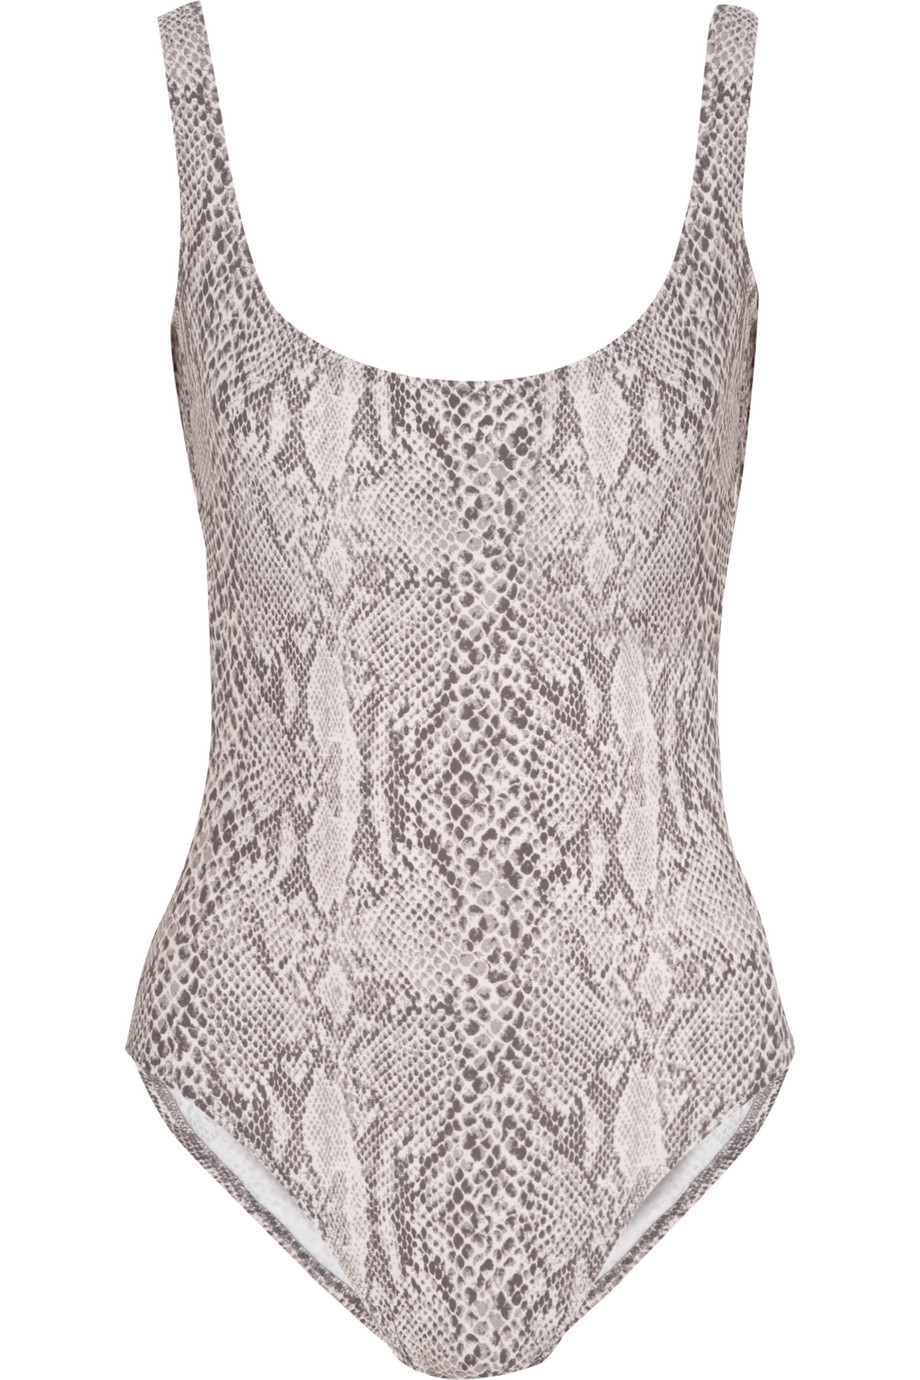 Norma Kamali Snake-Print Swimsuit, Snake Print/Beige, Women's, Size: XS